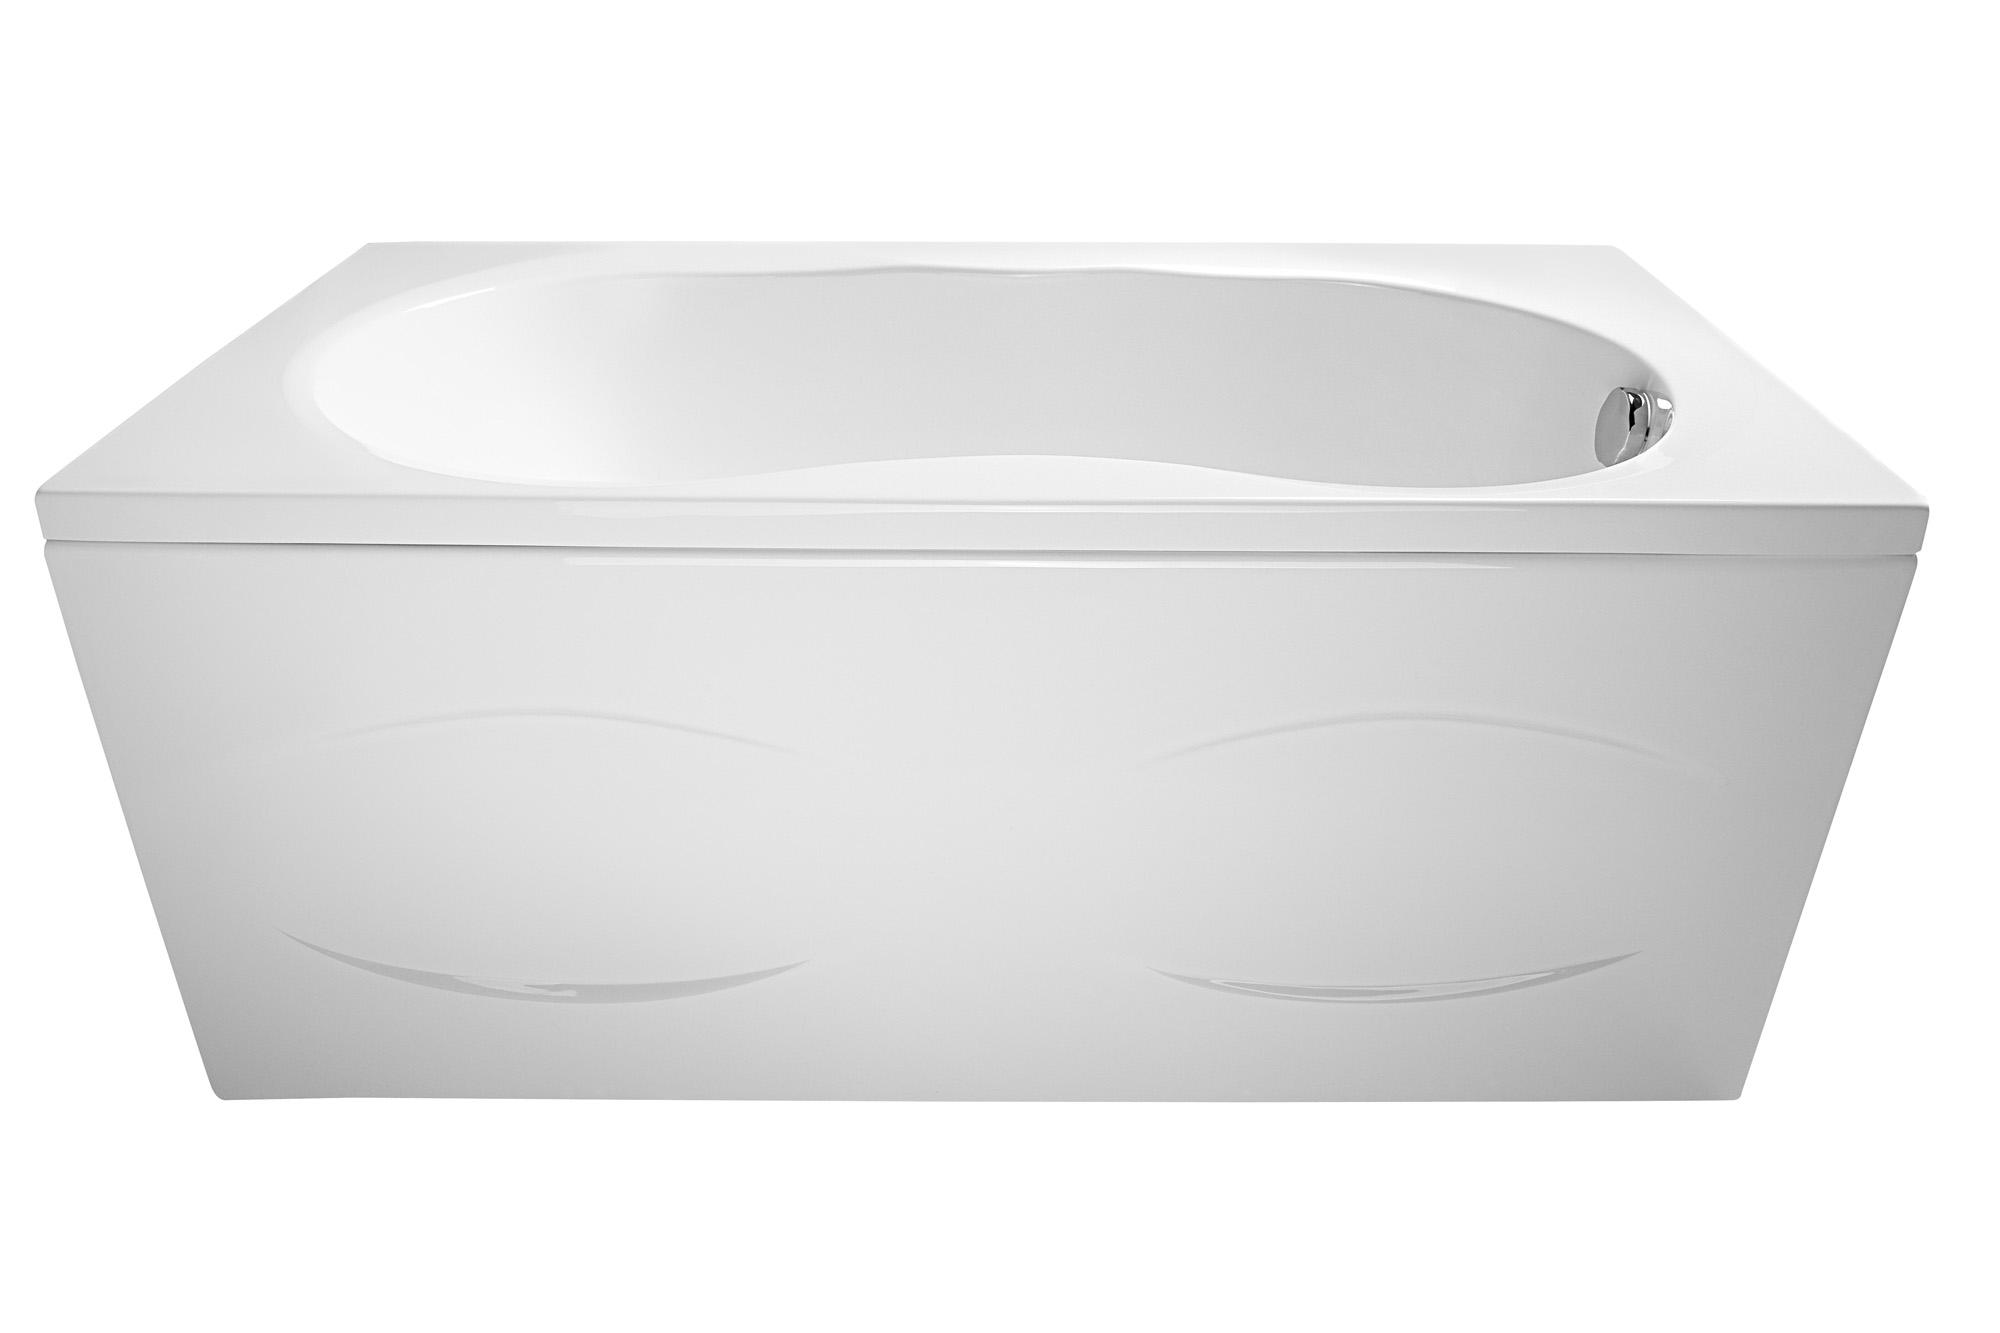 Ванна Relisan Lada 160x70 с гидромассажем